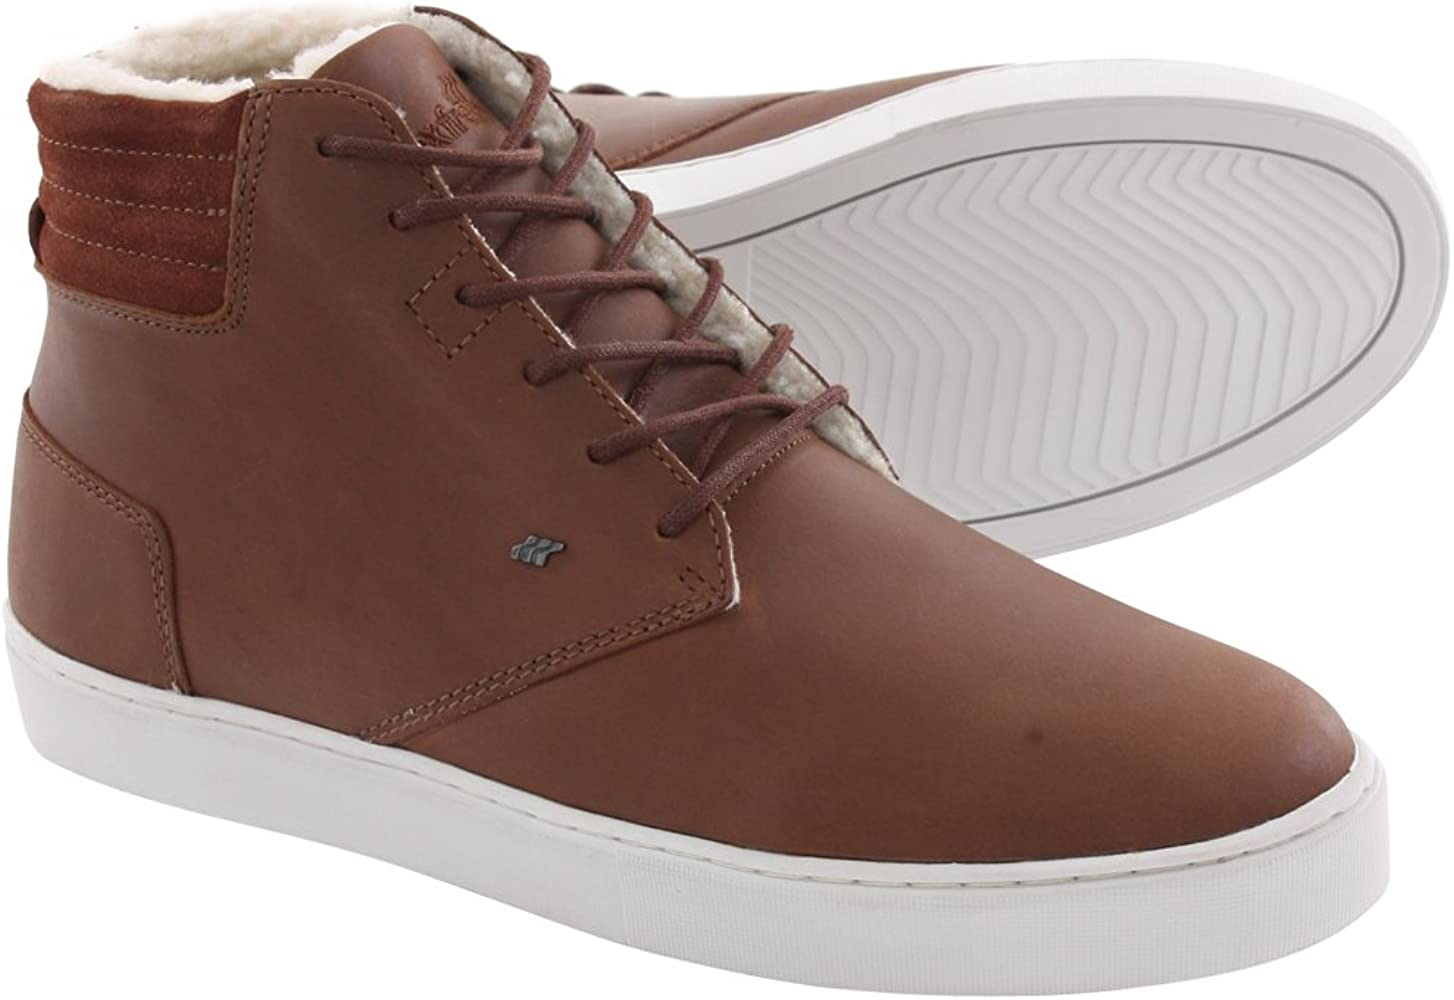 Boxfresh gvlr Fur Zapatos 2014 Bitter Chocolate, Color Marrón ...